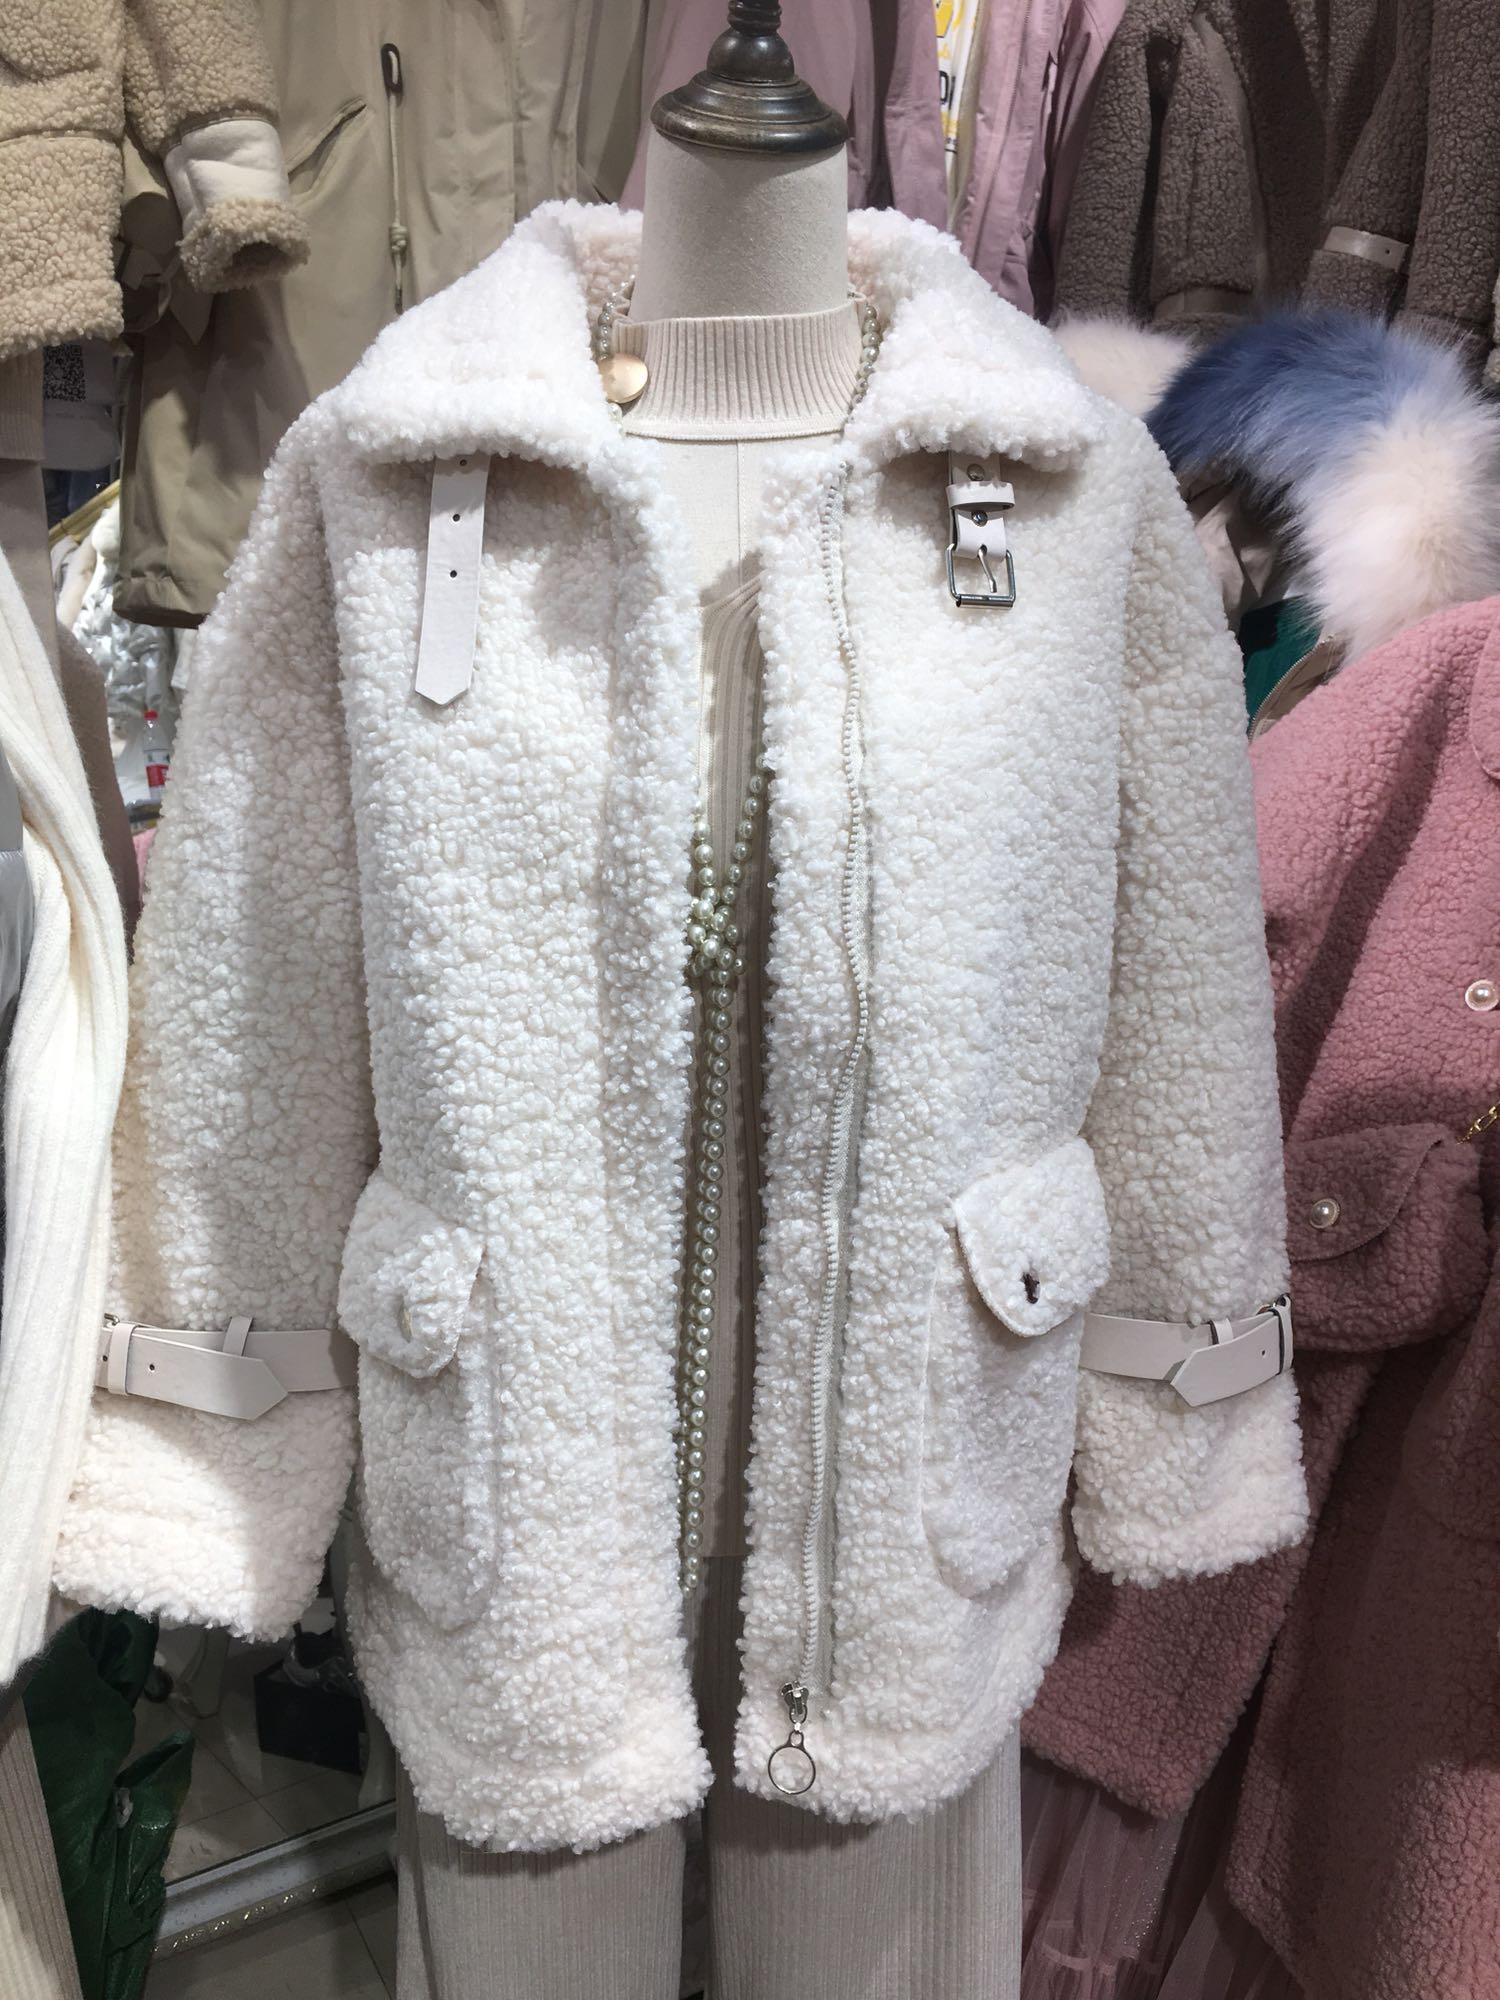 florarist 新款2020春小清新羊羔毛皮毛一体机车衣领女装外套